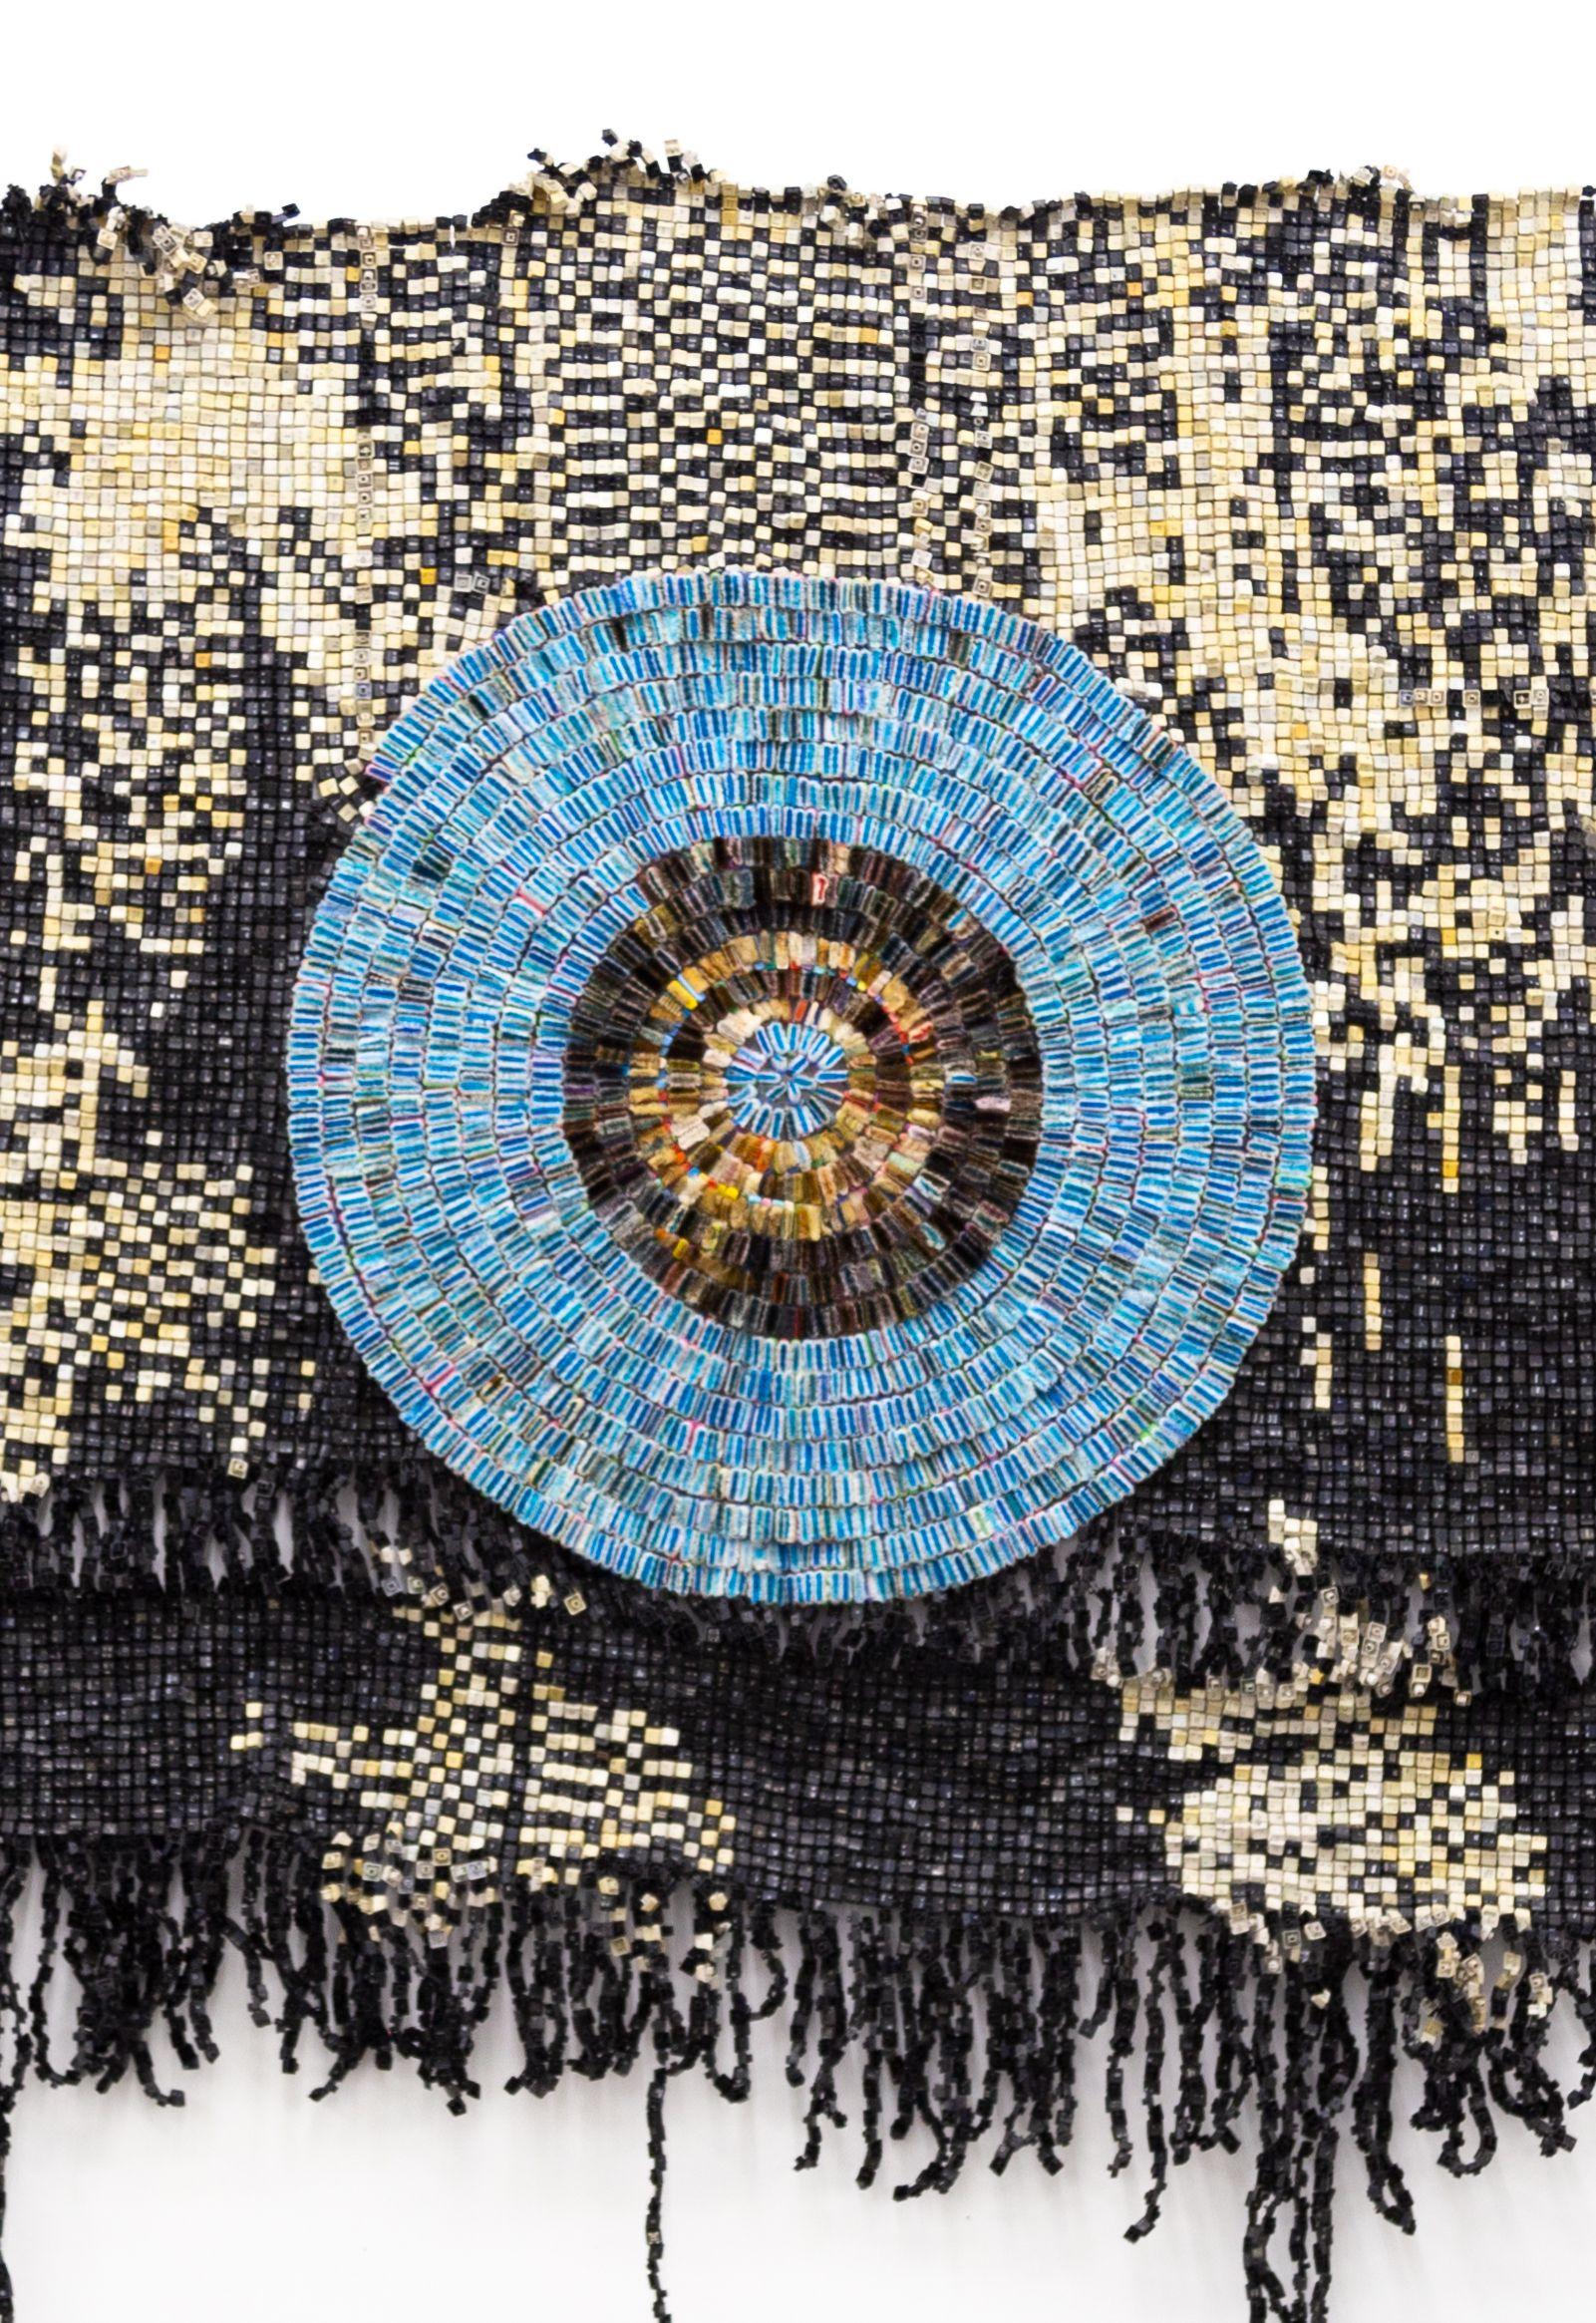 Moffat Takadiwa, Three little witches, 2021 Witch Craft : Rethinking Power, Craft Contemporary, Los Angeles (US) 3 octobre 2021 - 9 janvier 2022 Photo: Moffat Takadiwa